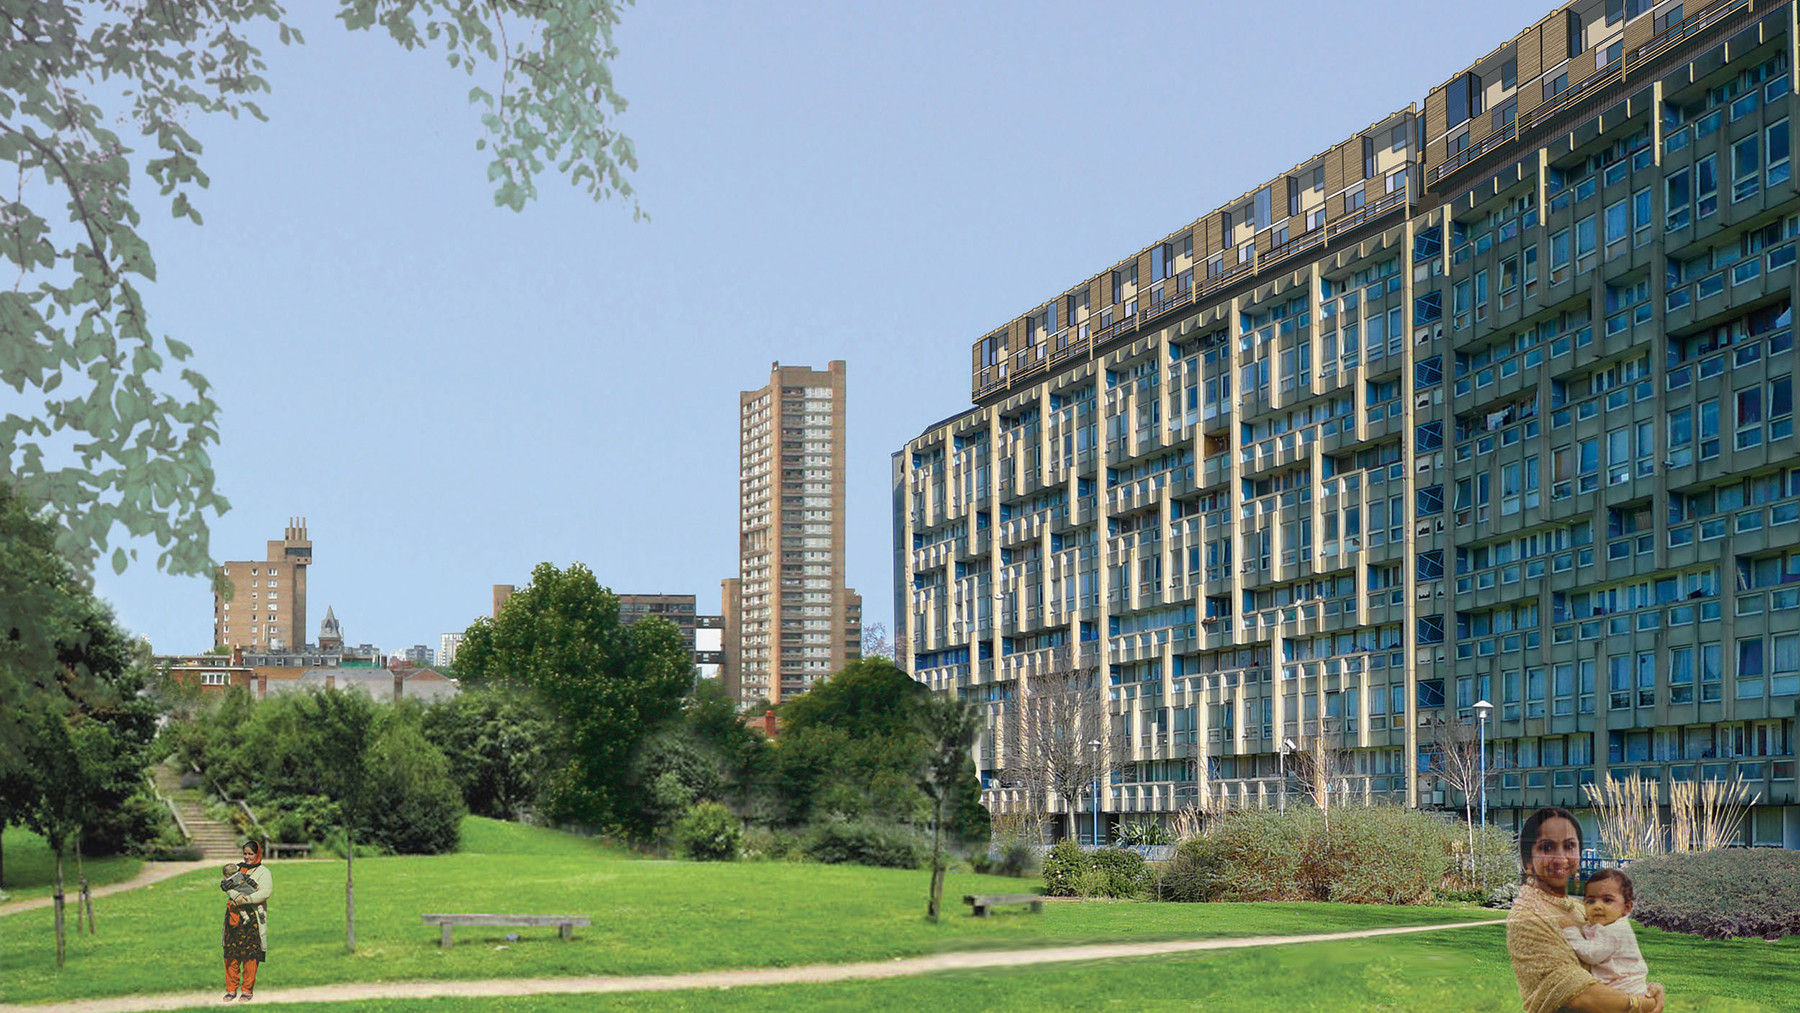 Sarah-Wigglesworth-Architects Robin-Hood-Gardens-Retrospective Economic-Sustainability 1800